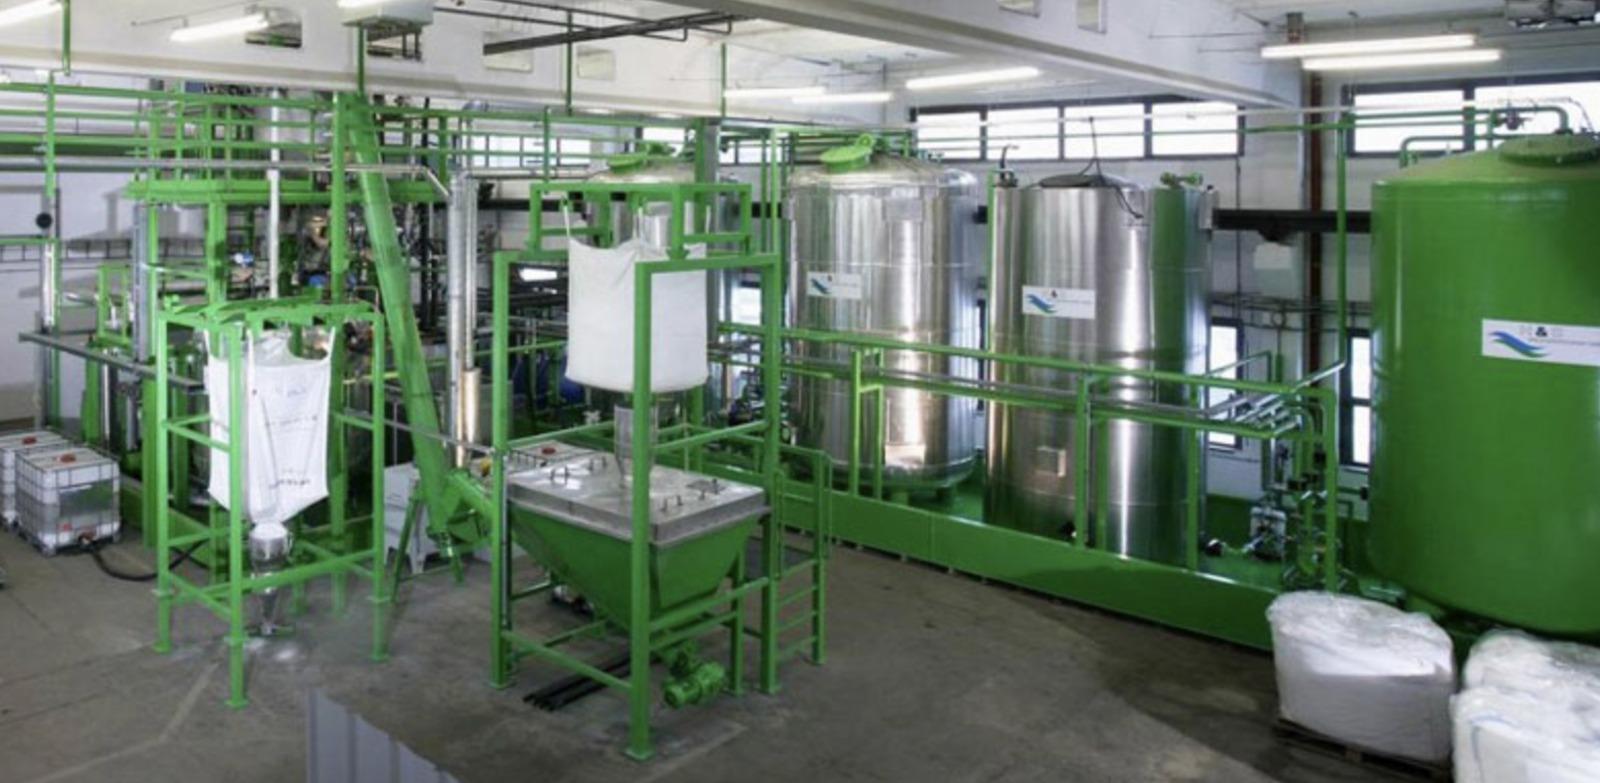 tanks storage systems